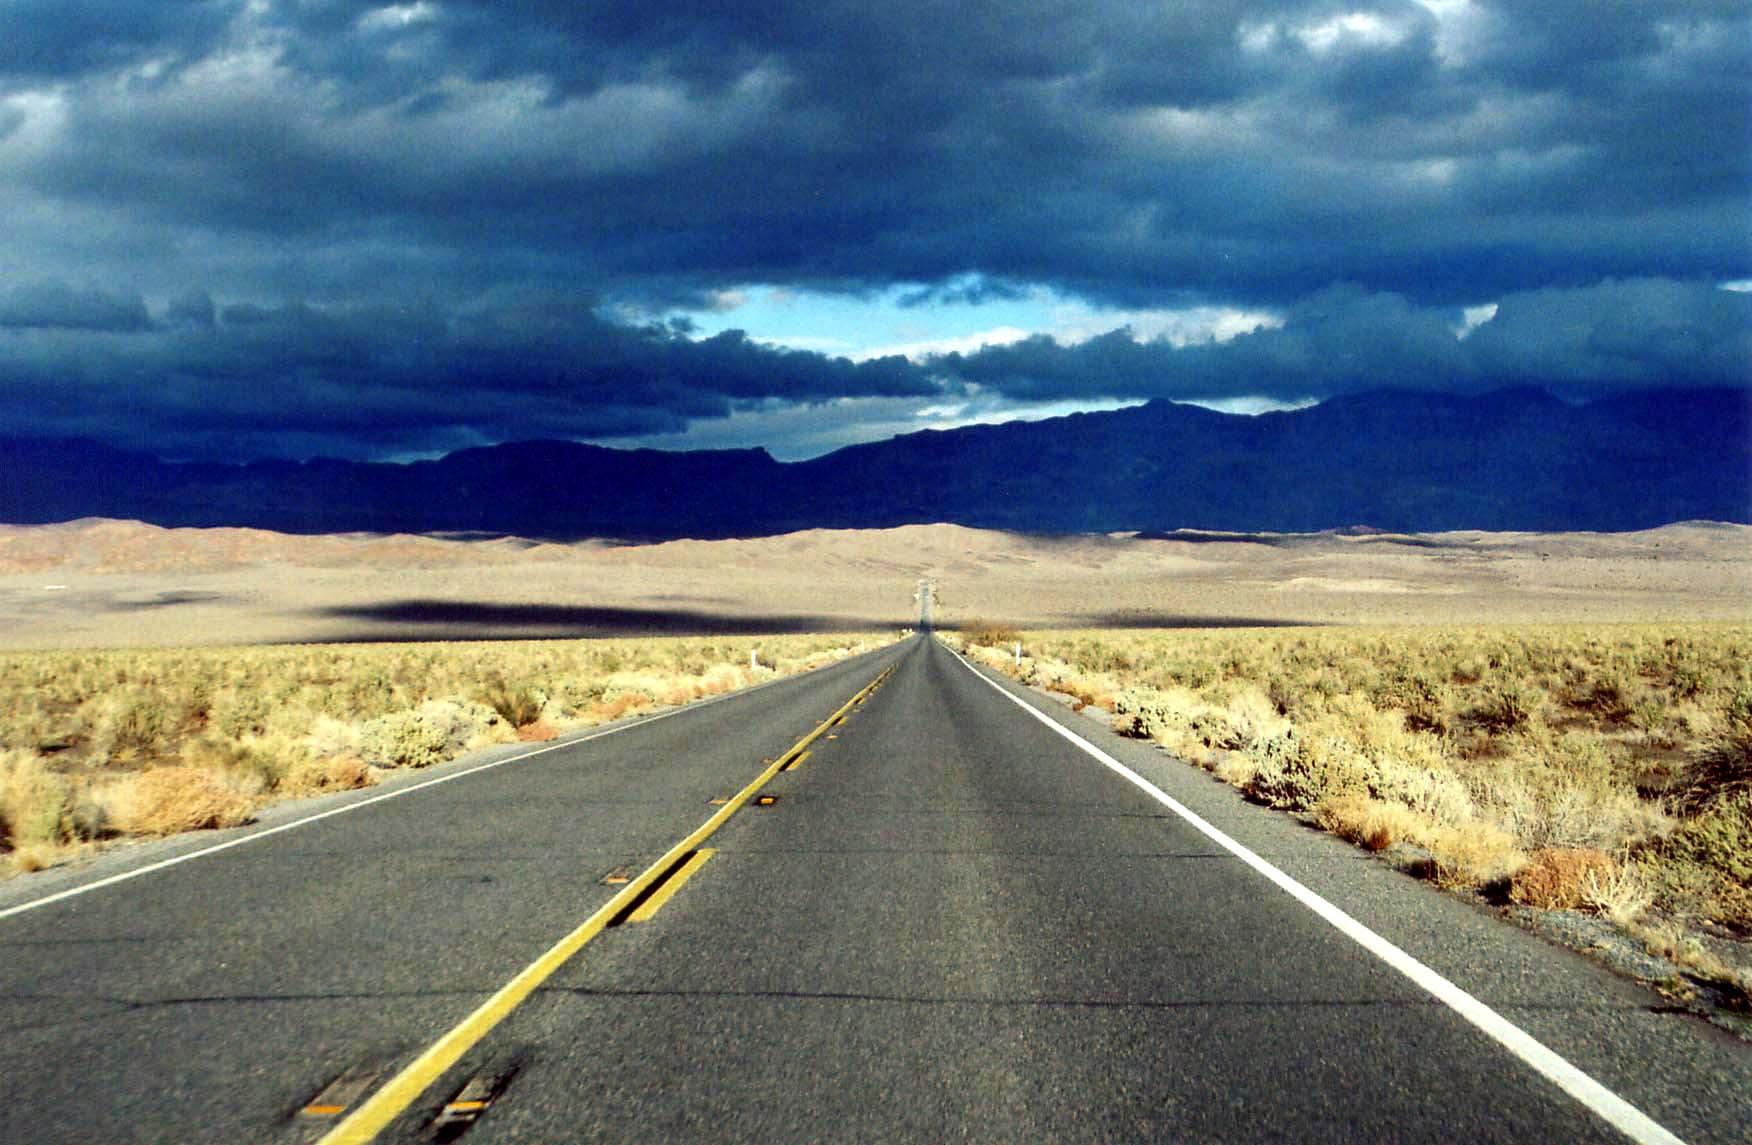 Long exposure photo of gray concrete road HD wallpaper | Wallpaper Flare